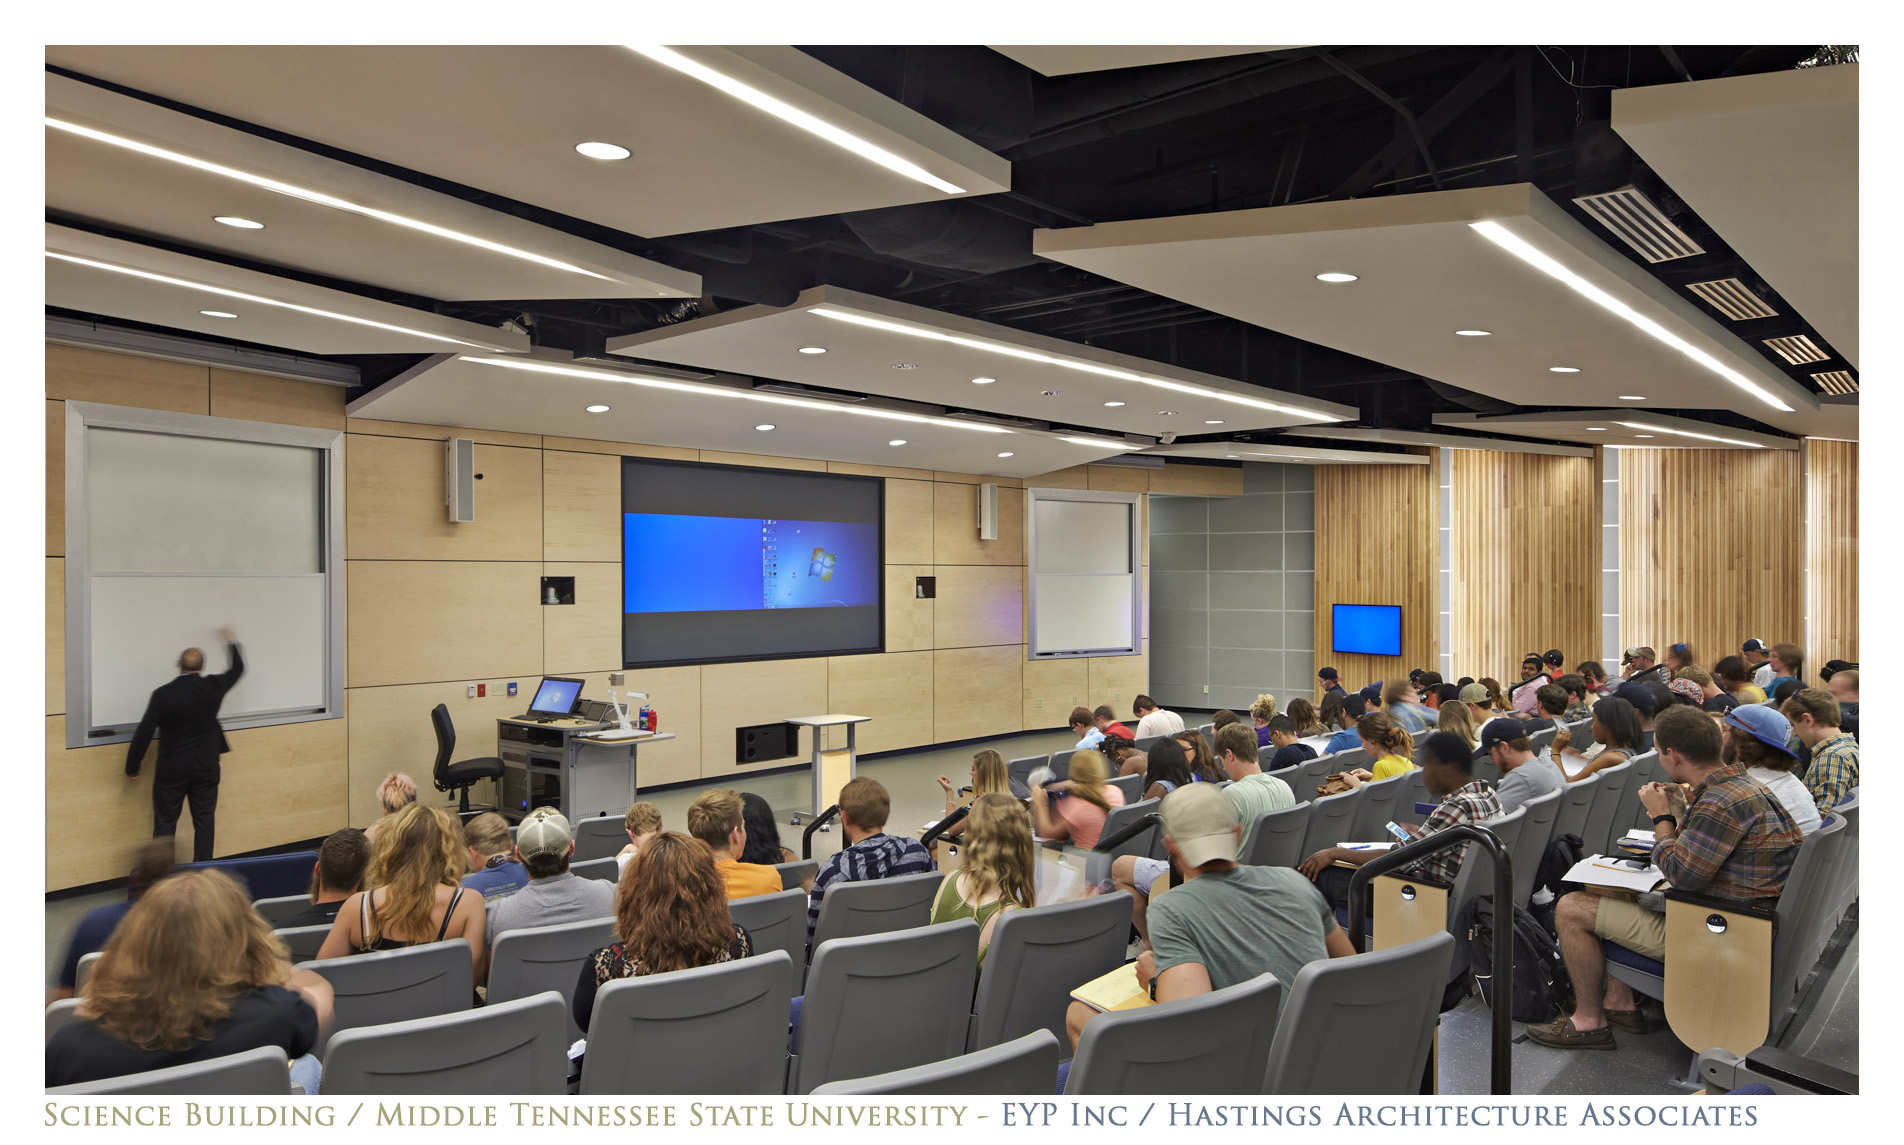 036_Robert-Benson-Photography-EYP-MTSU-Science-Building-Lecture-Hall-21.jpg